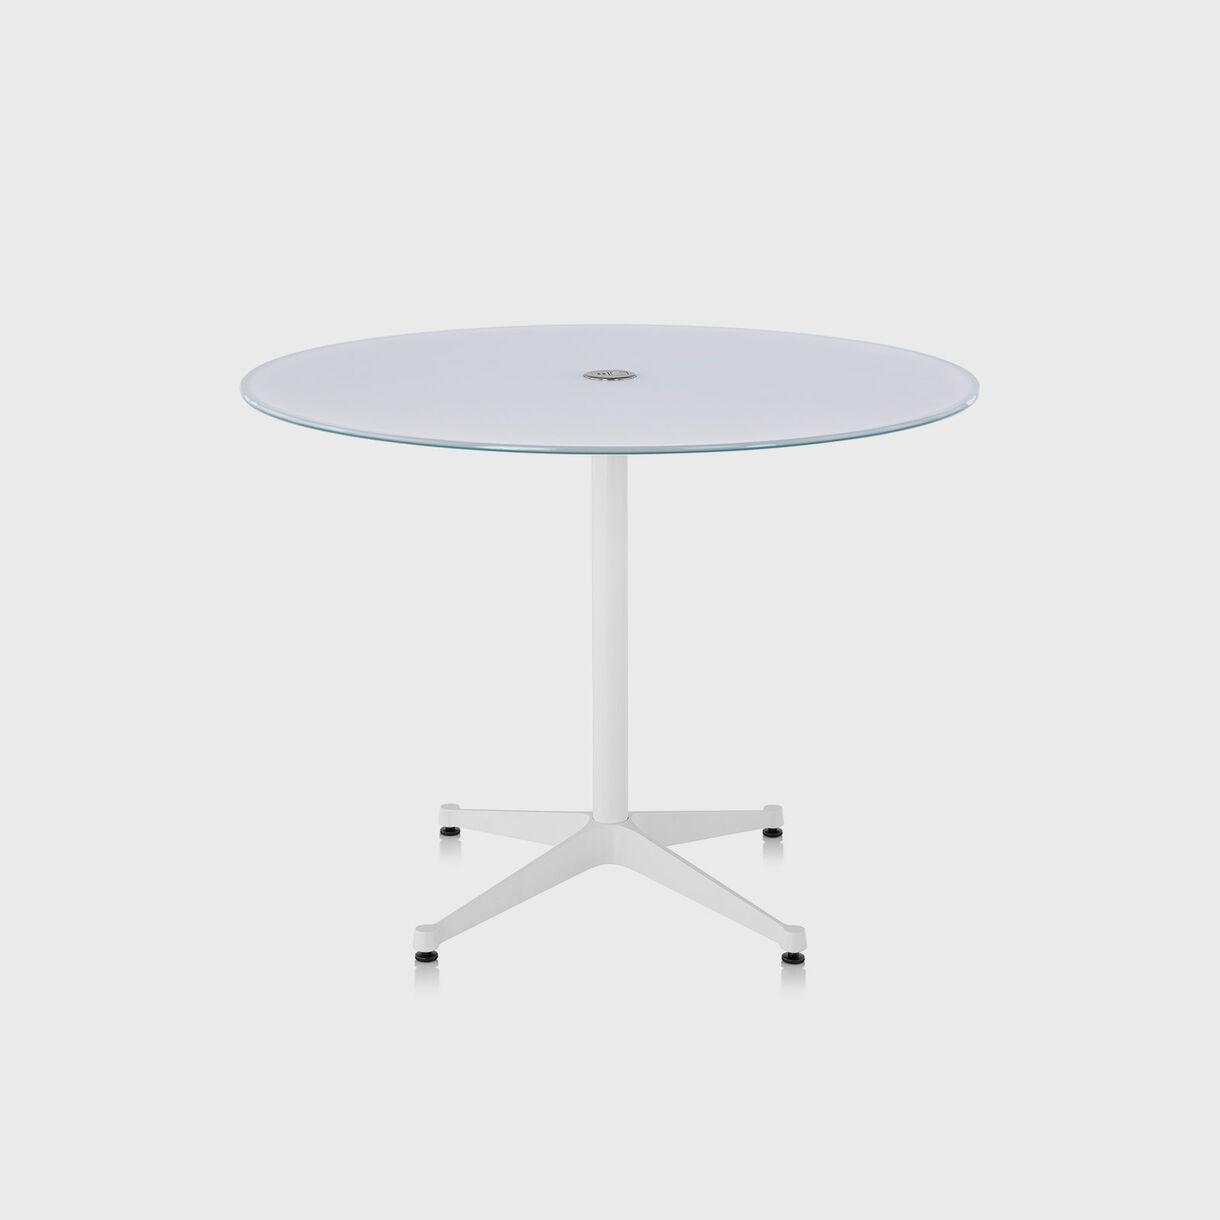 Eames Table, Contract Base